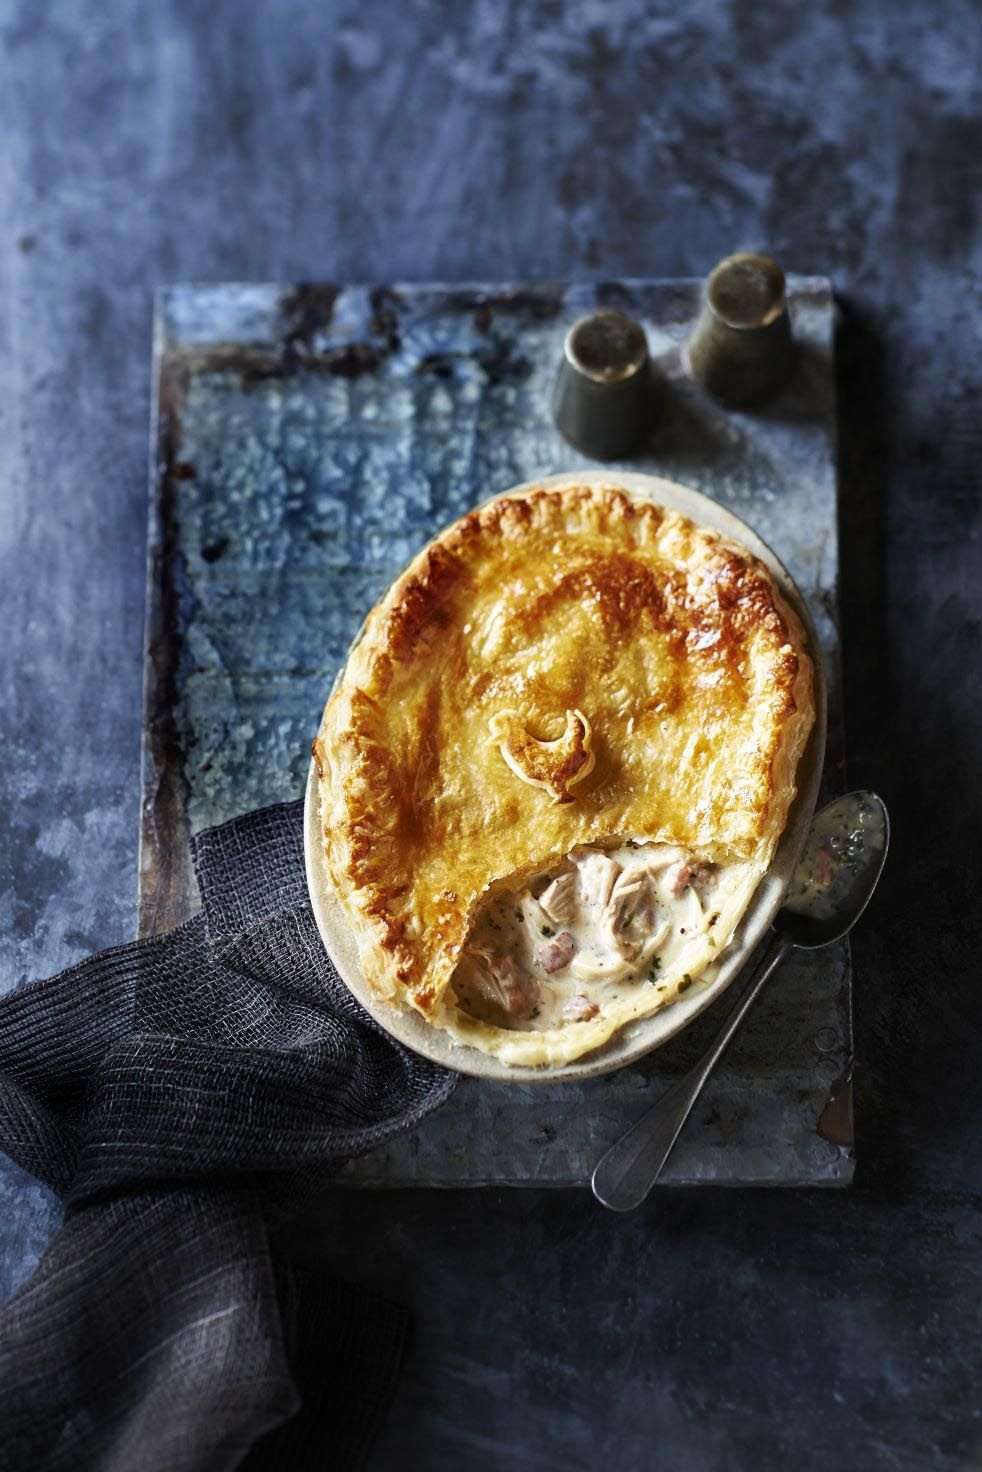 Chicken, cider and bacon puff pie, olive magazine, March 2014